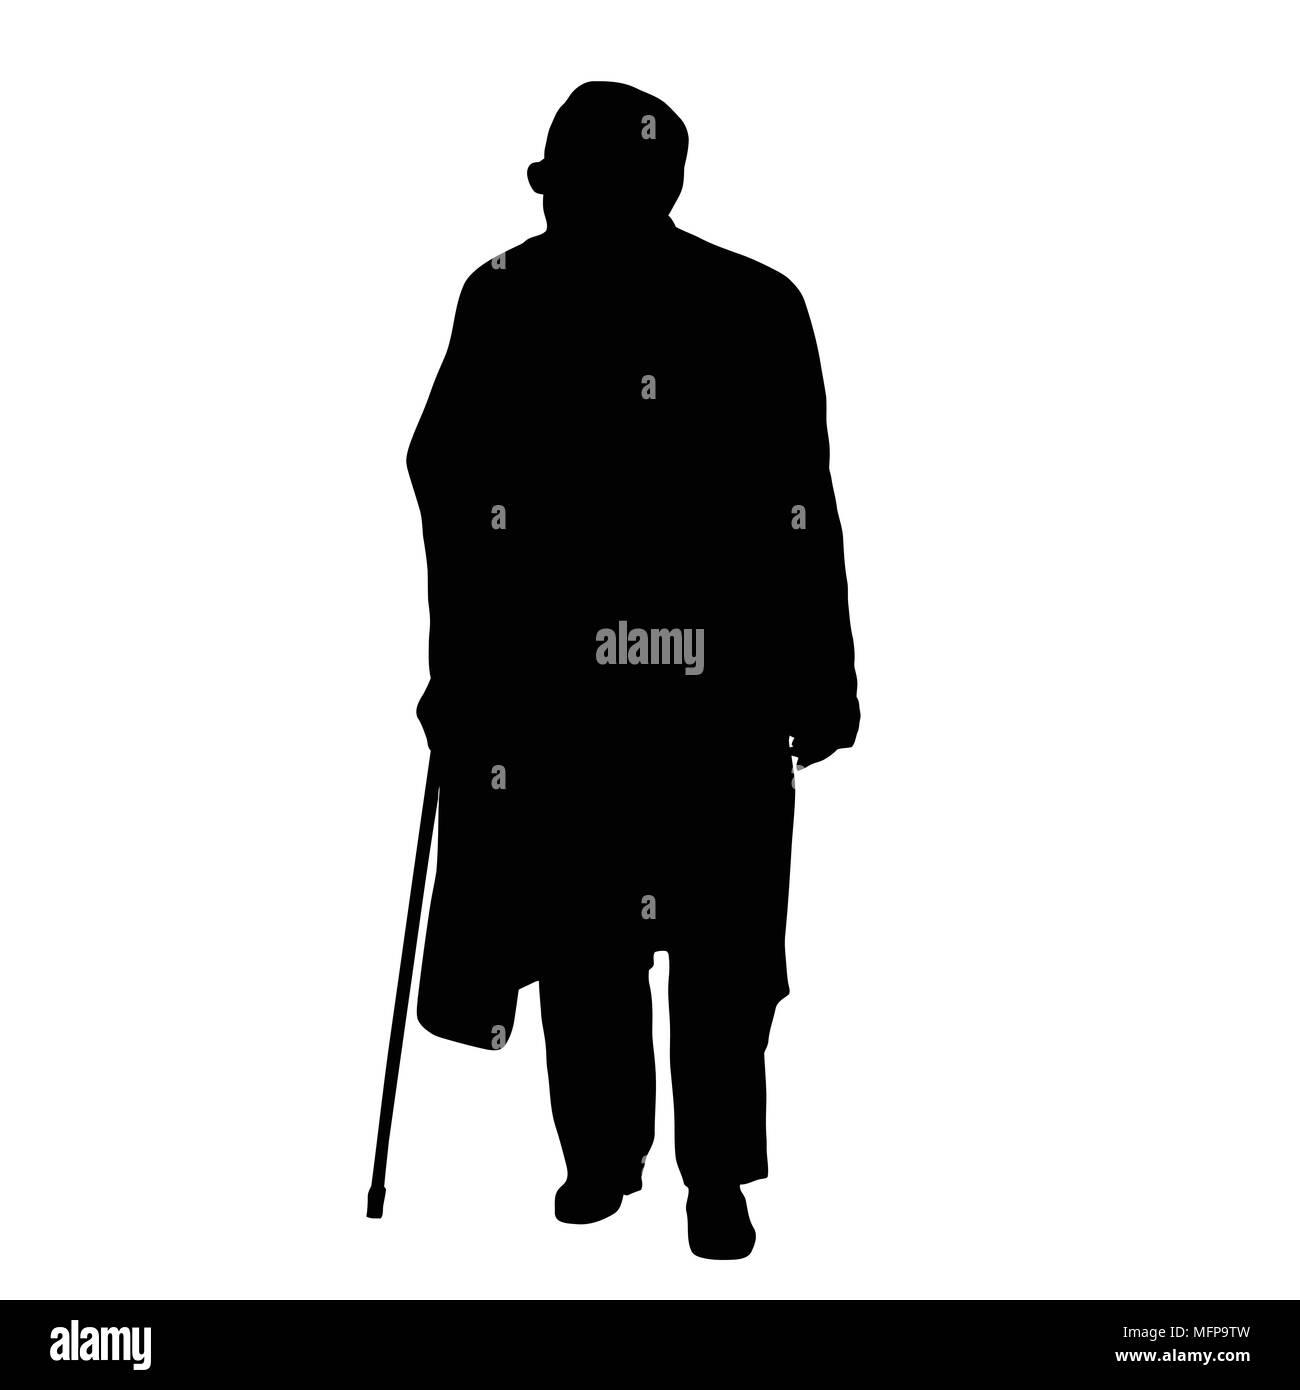 Old man silhouette on white background, vector illustration Stock Vector